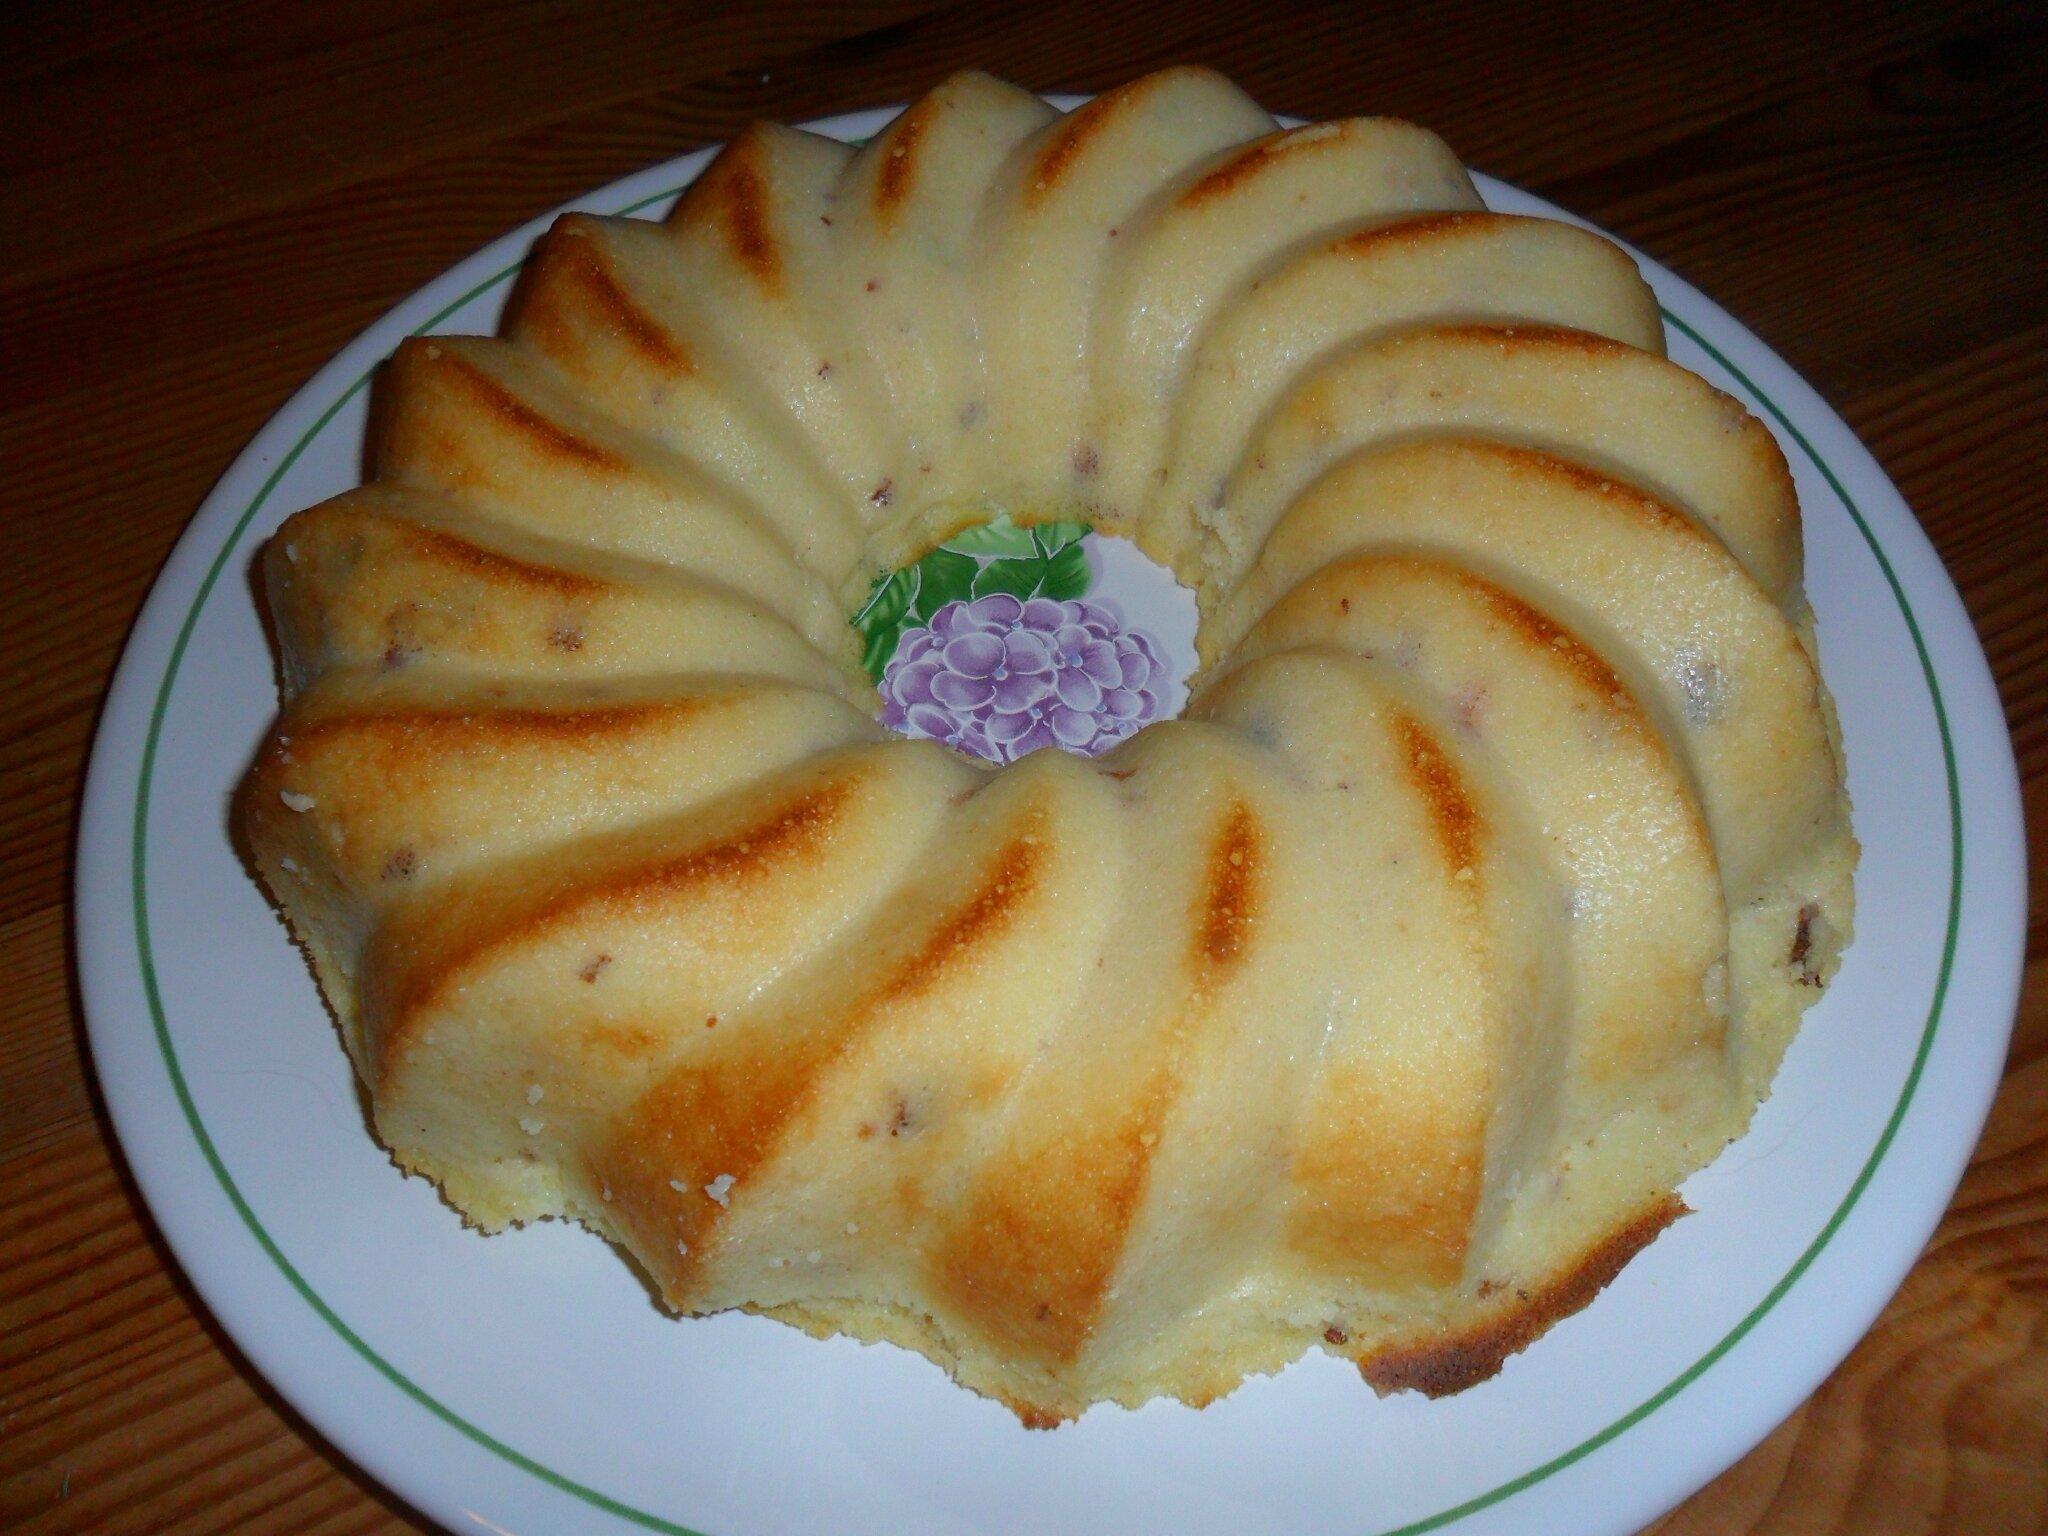 Gateau de semoule recette grand mere